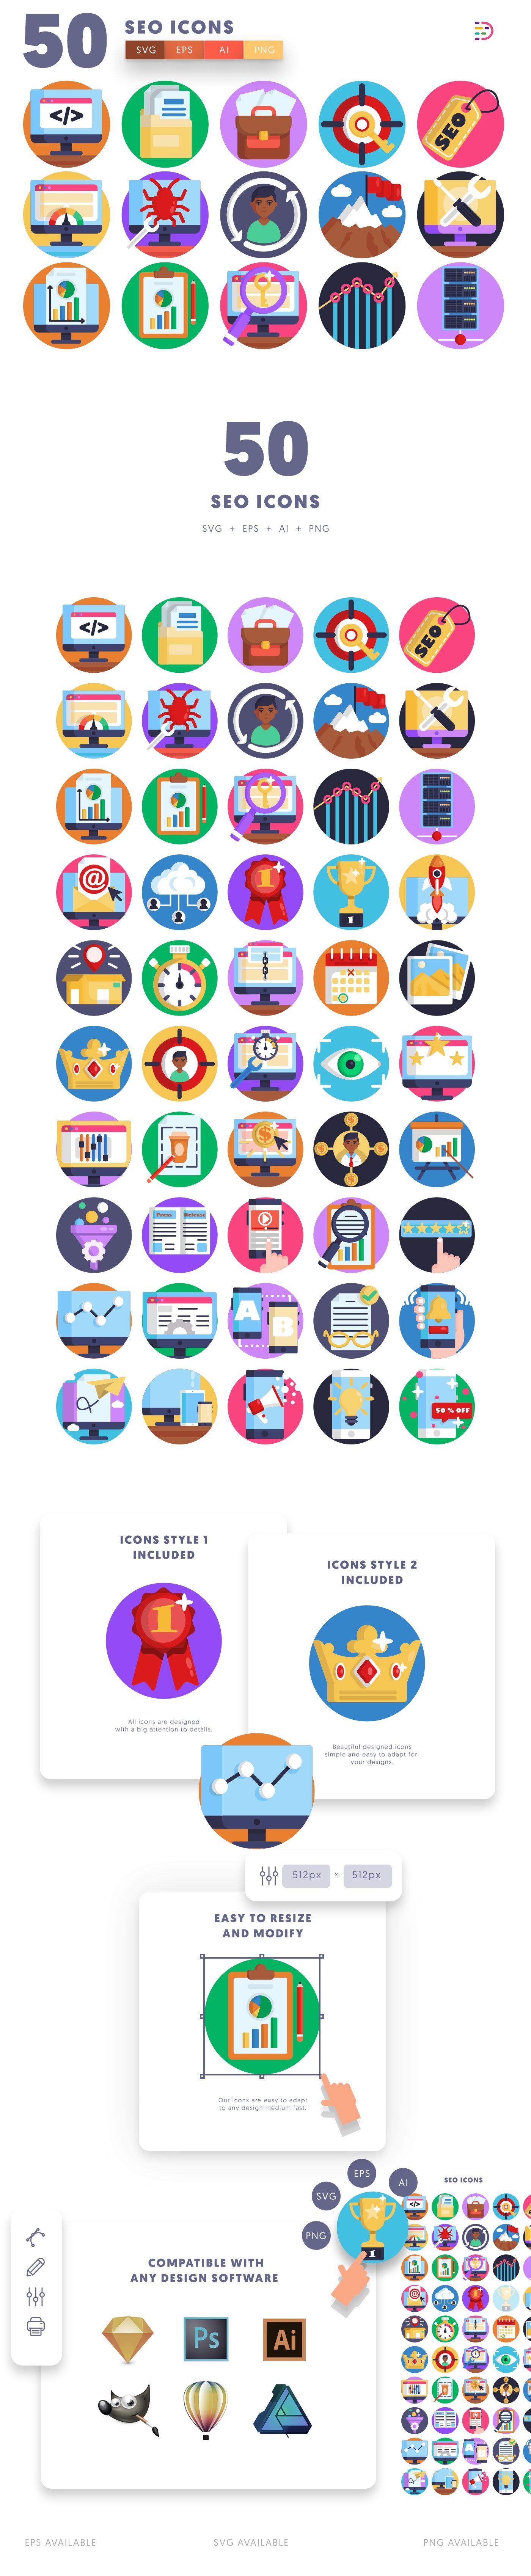 SEO icons info graphic